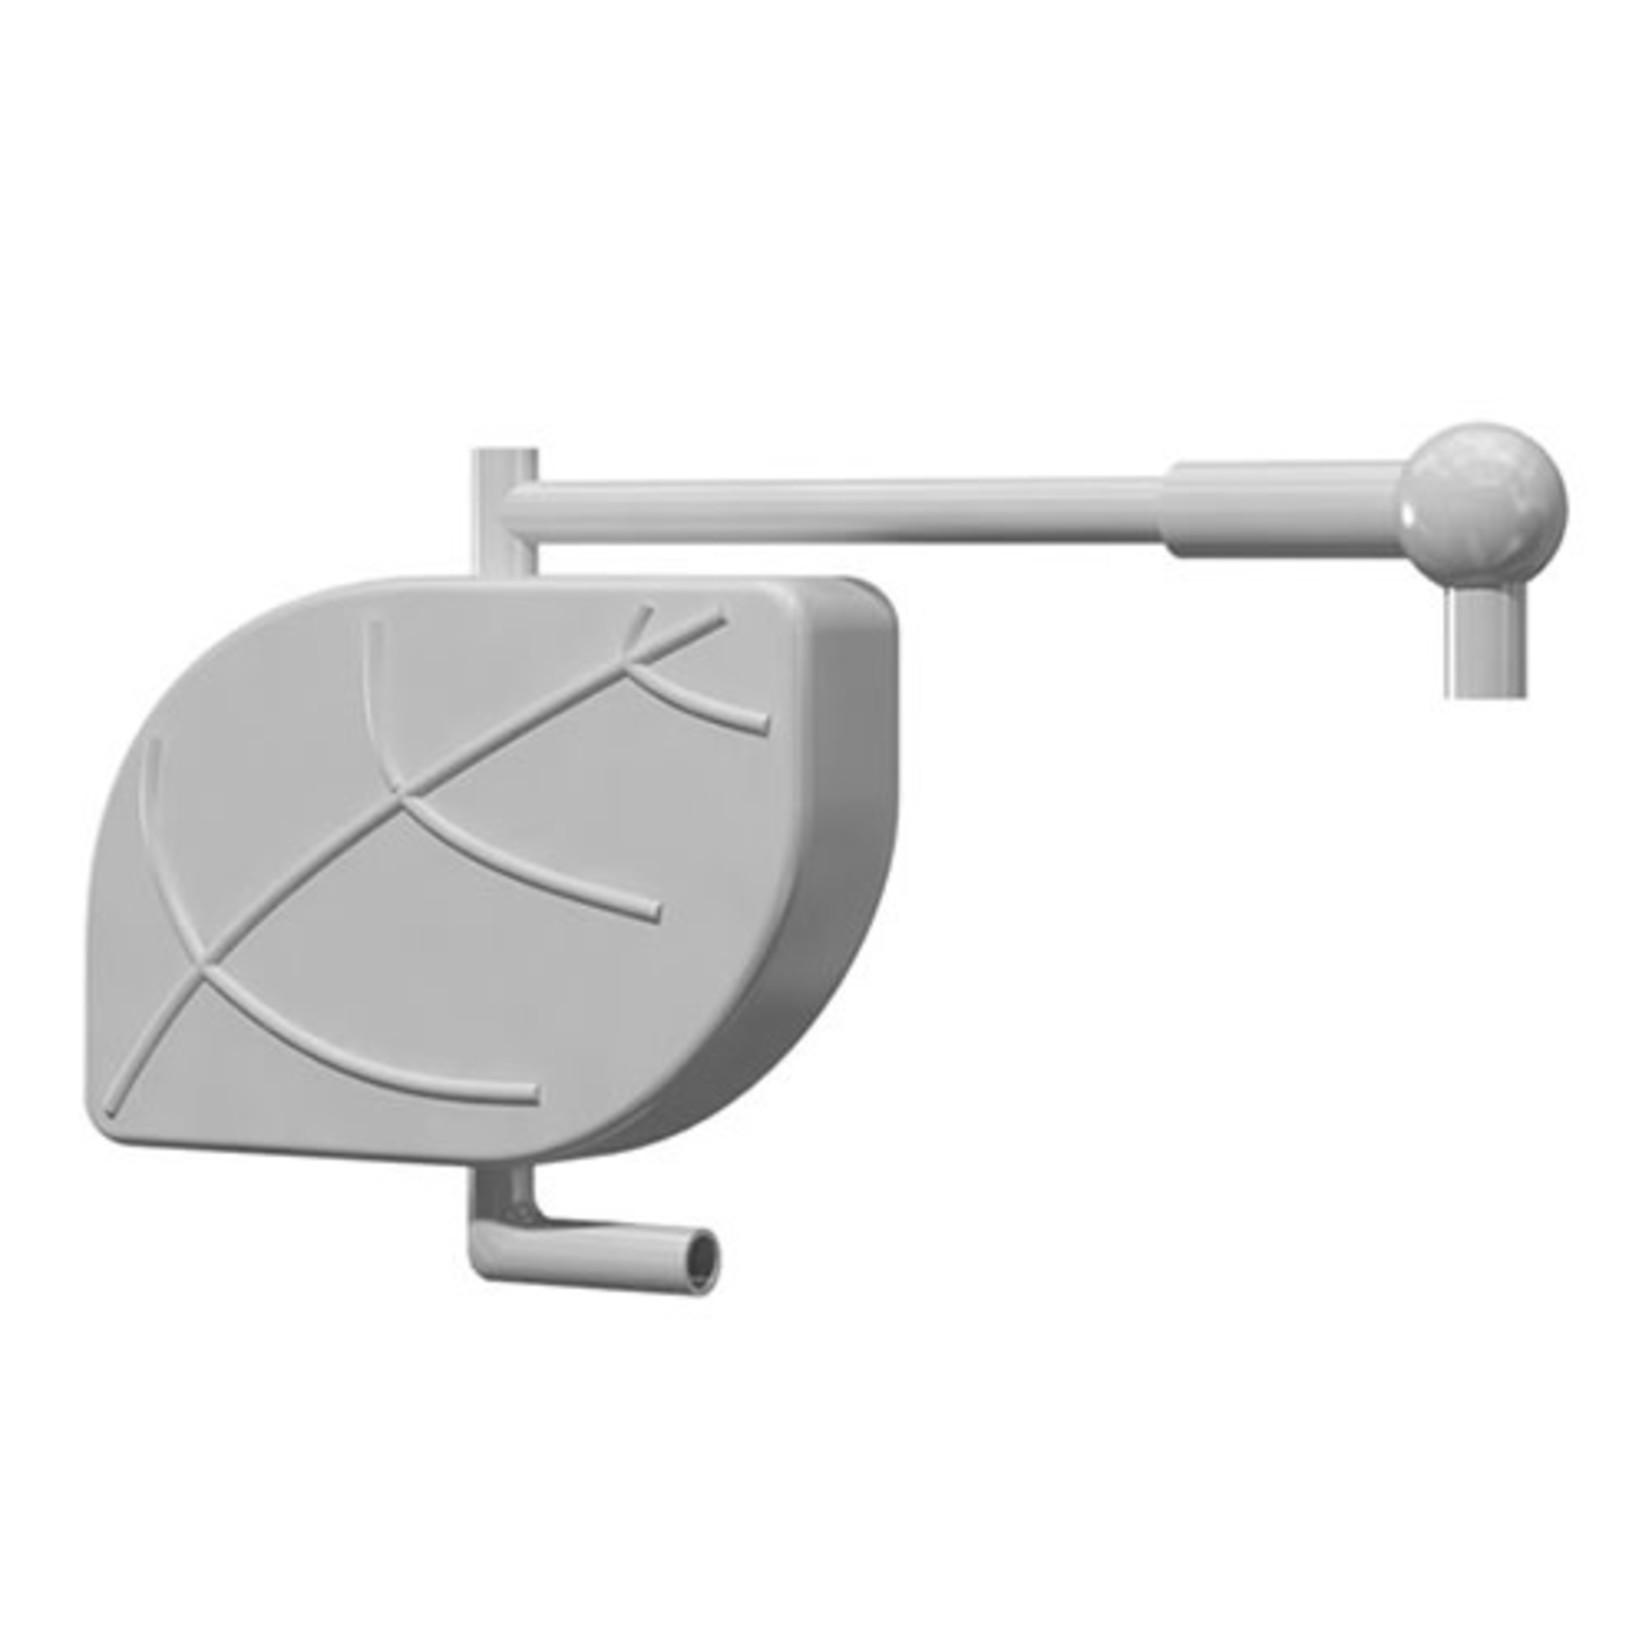 Enagic Kangen Enagic secondary discharge water stand